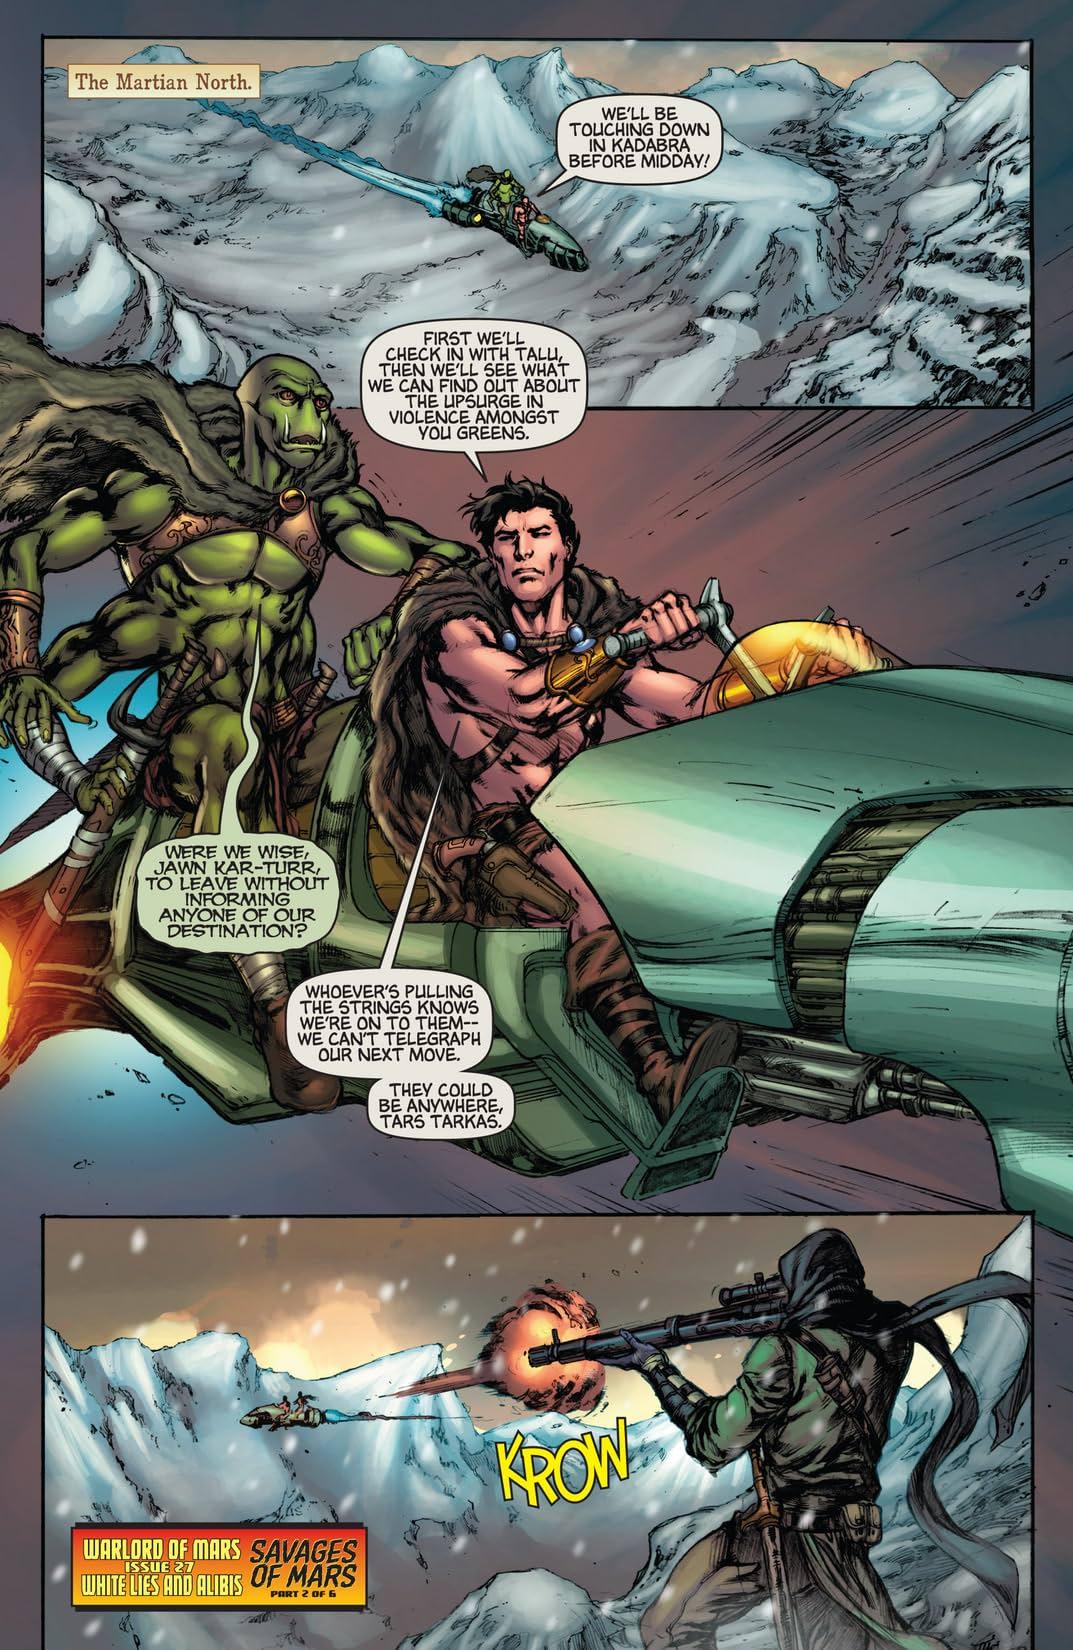 Warlord of Mars #27